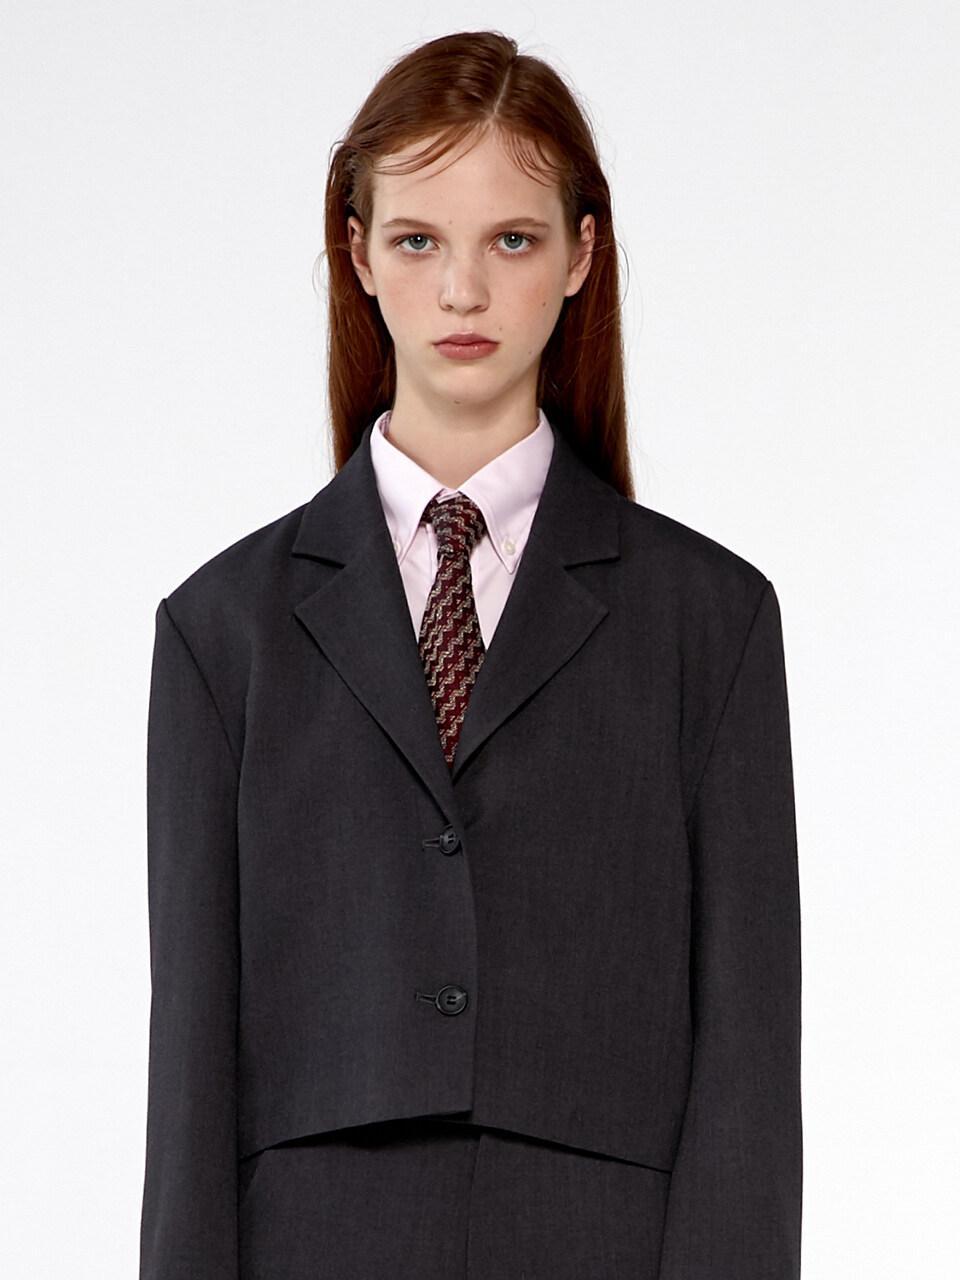 KIRSH国际品牌品牌2020春夏短款翻领单排扣女士休闲西装_炭灰色